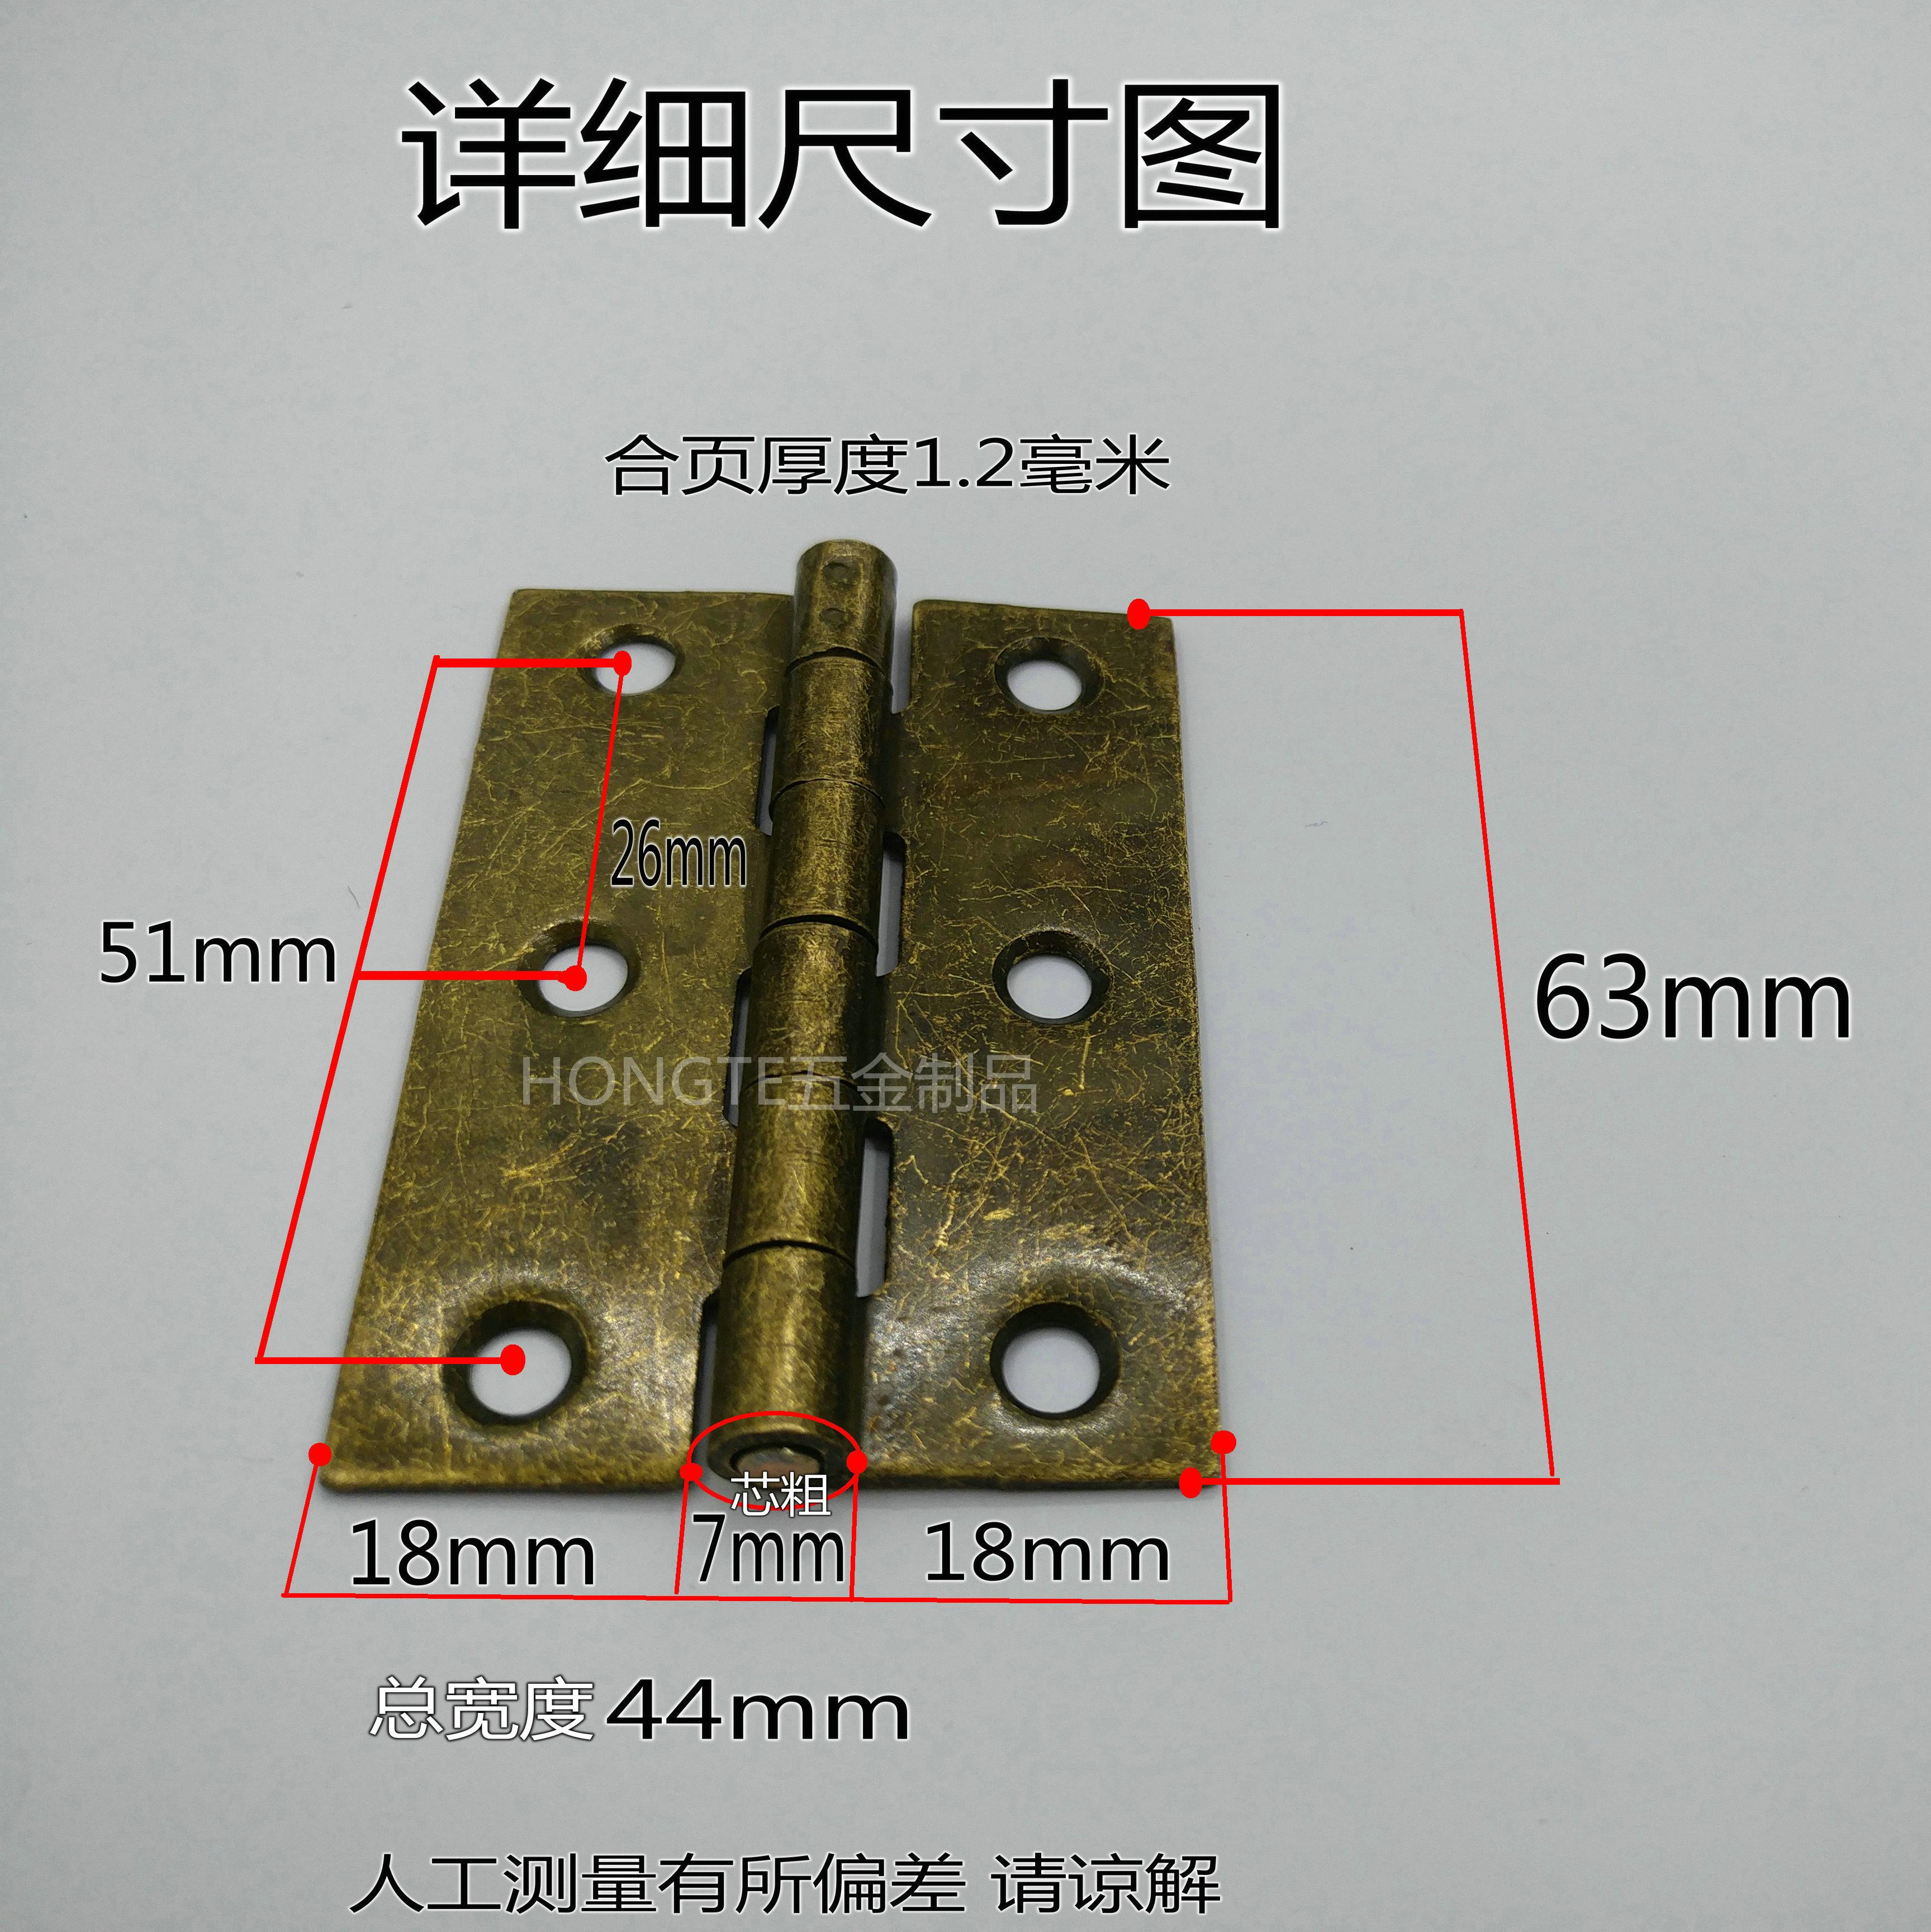 Thickening of antique bronze, 2.5 inch 1.2mm thick antique door, new classical European hinge furniture hardware hinge